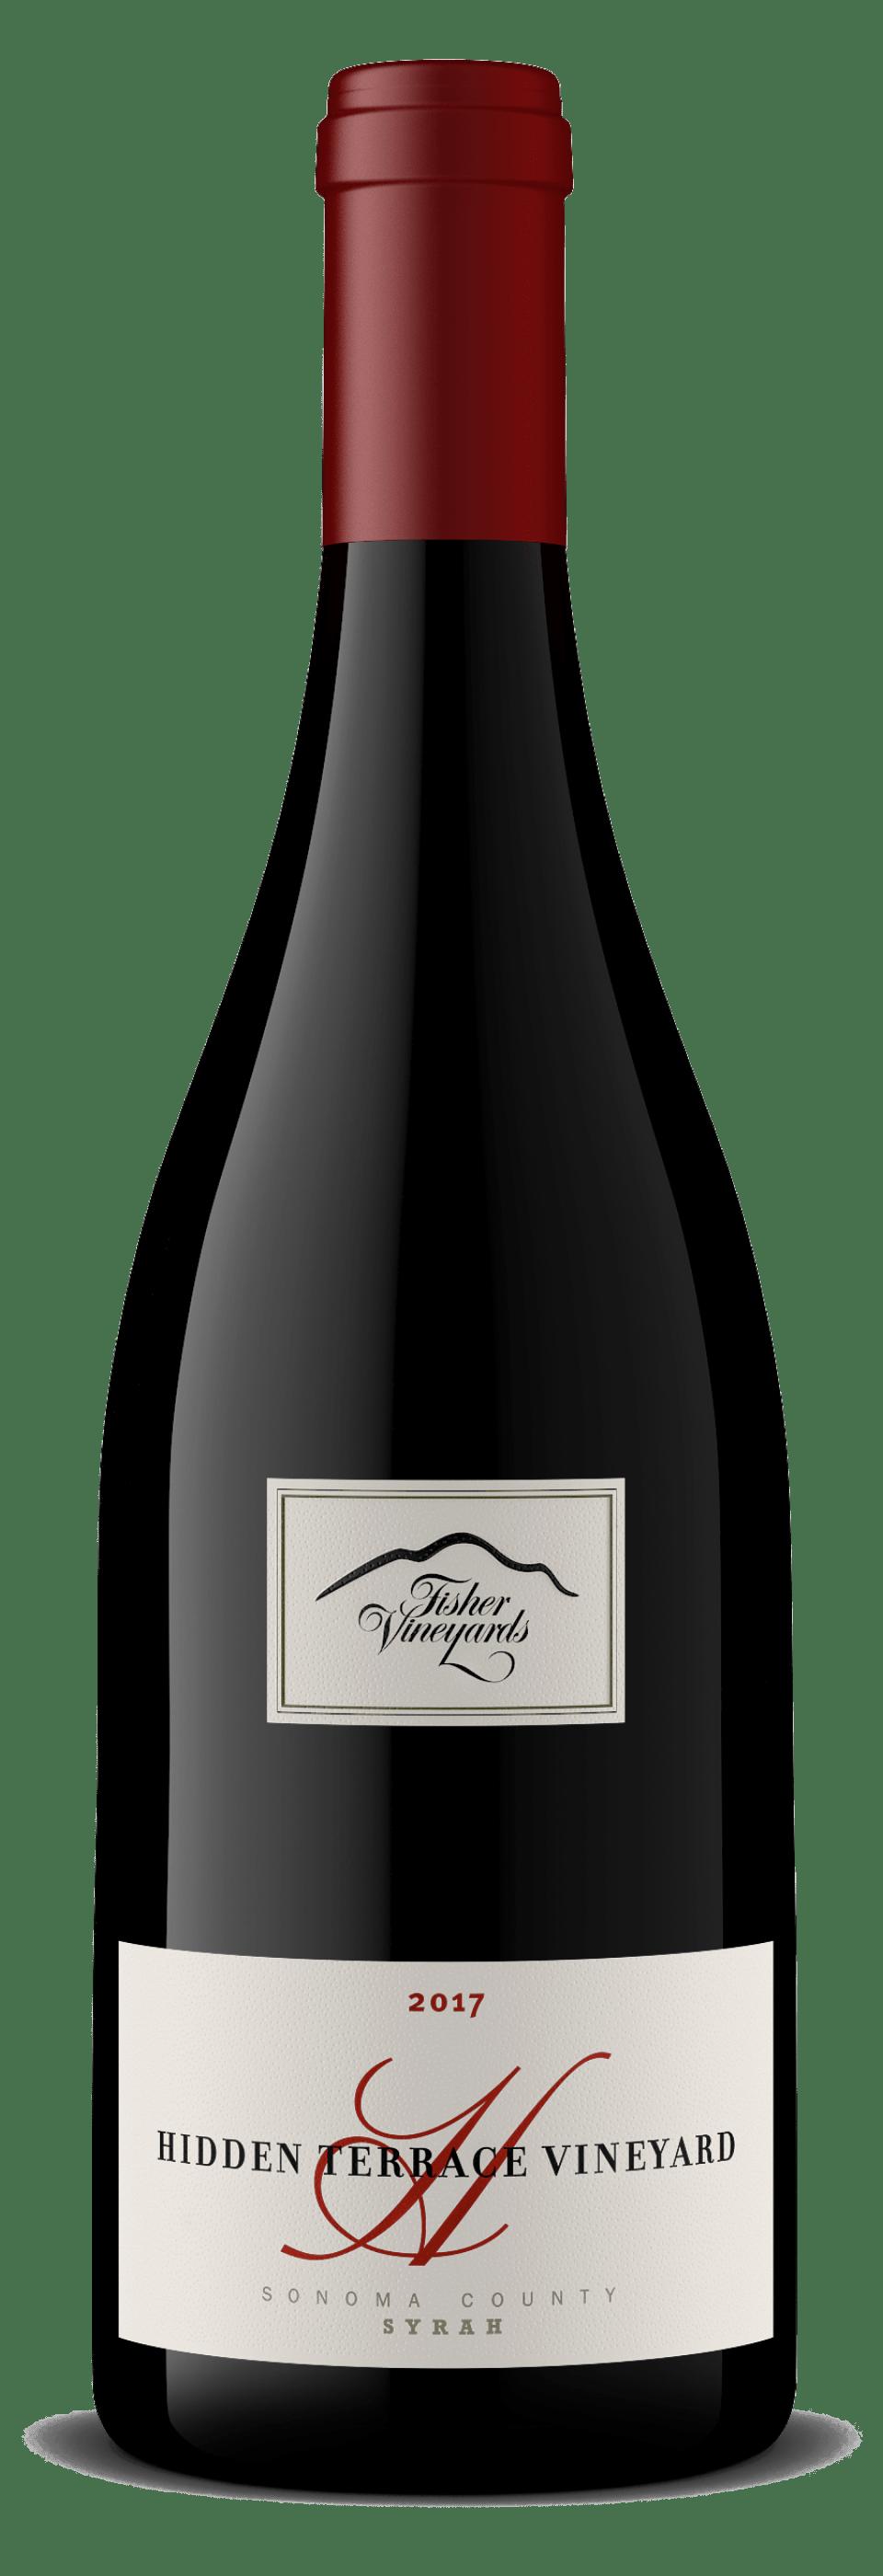 2017 Hidden Terrace Vineyard